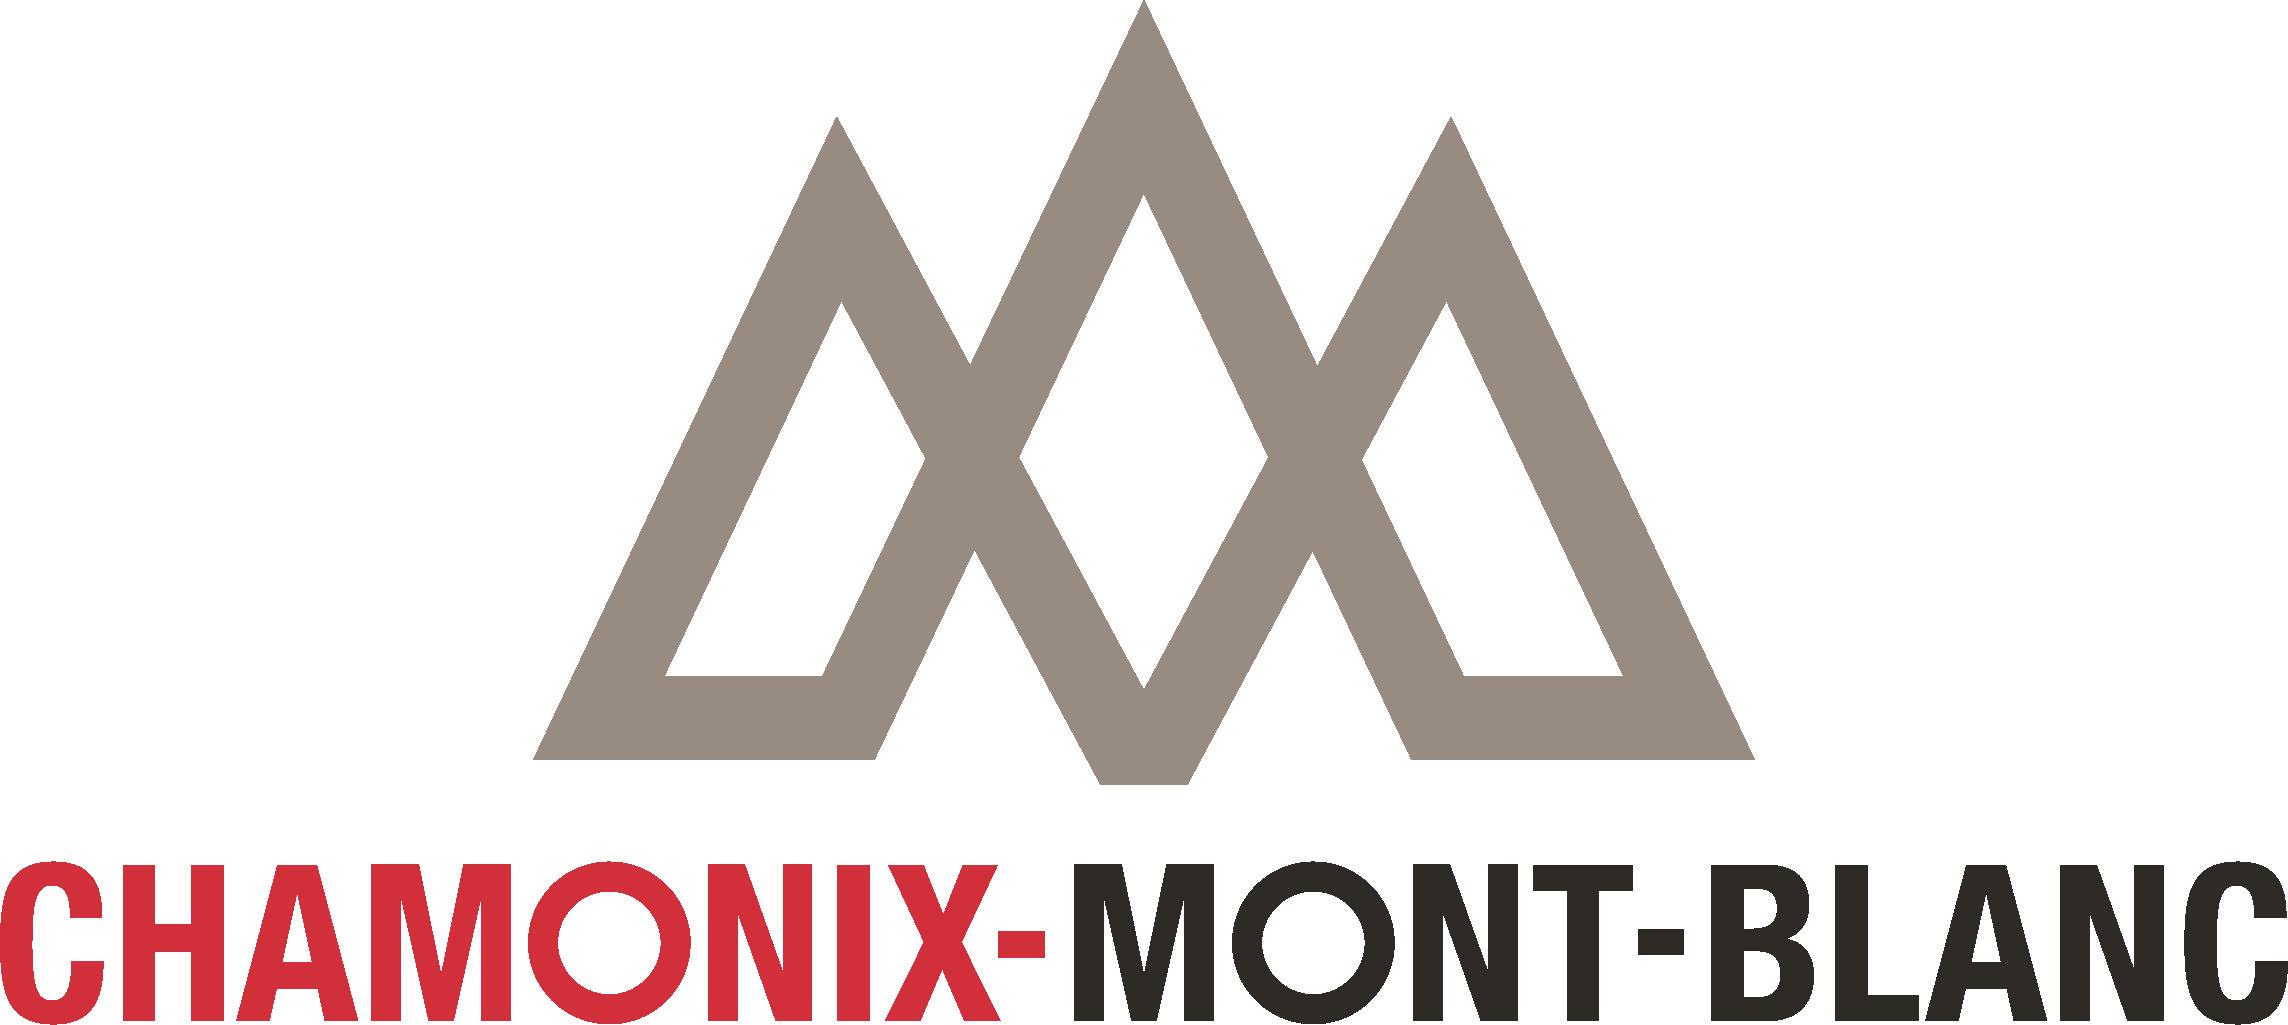 Chamonix Events Space City Ski Club